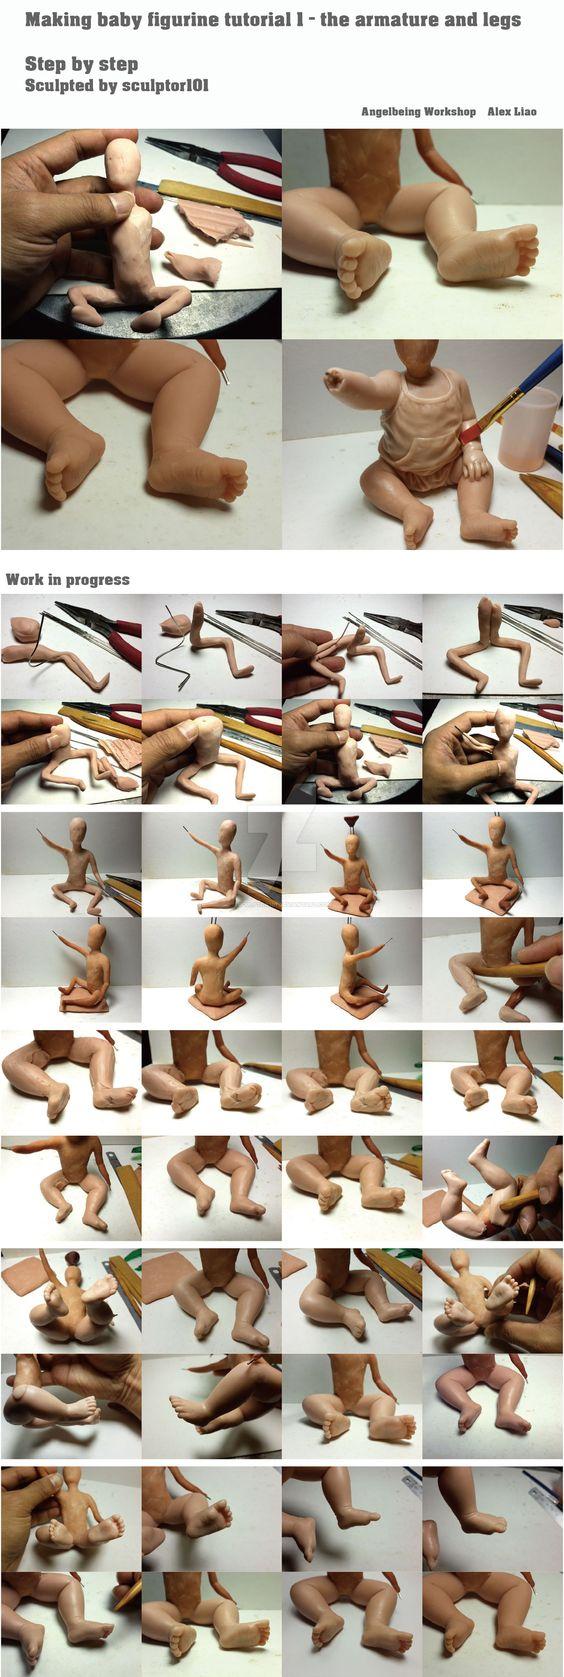 Making baby figurine tutorial 1 by sculptor101.deviantart.com on @DeviantArt